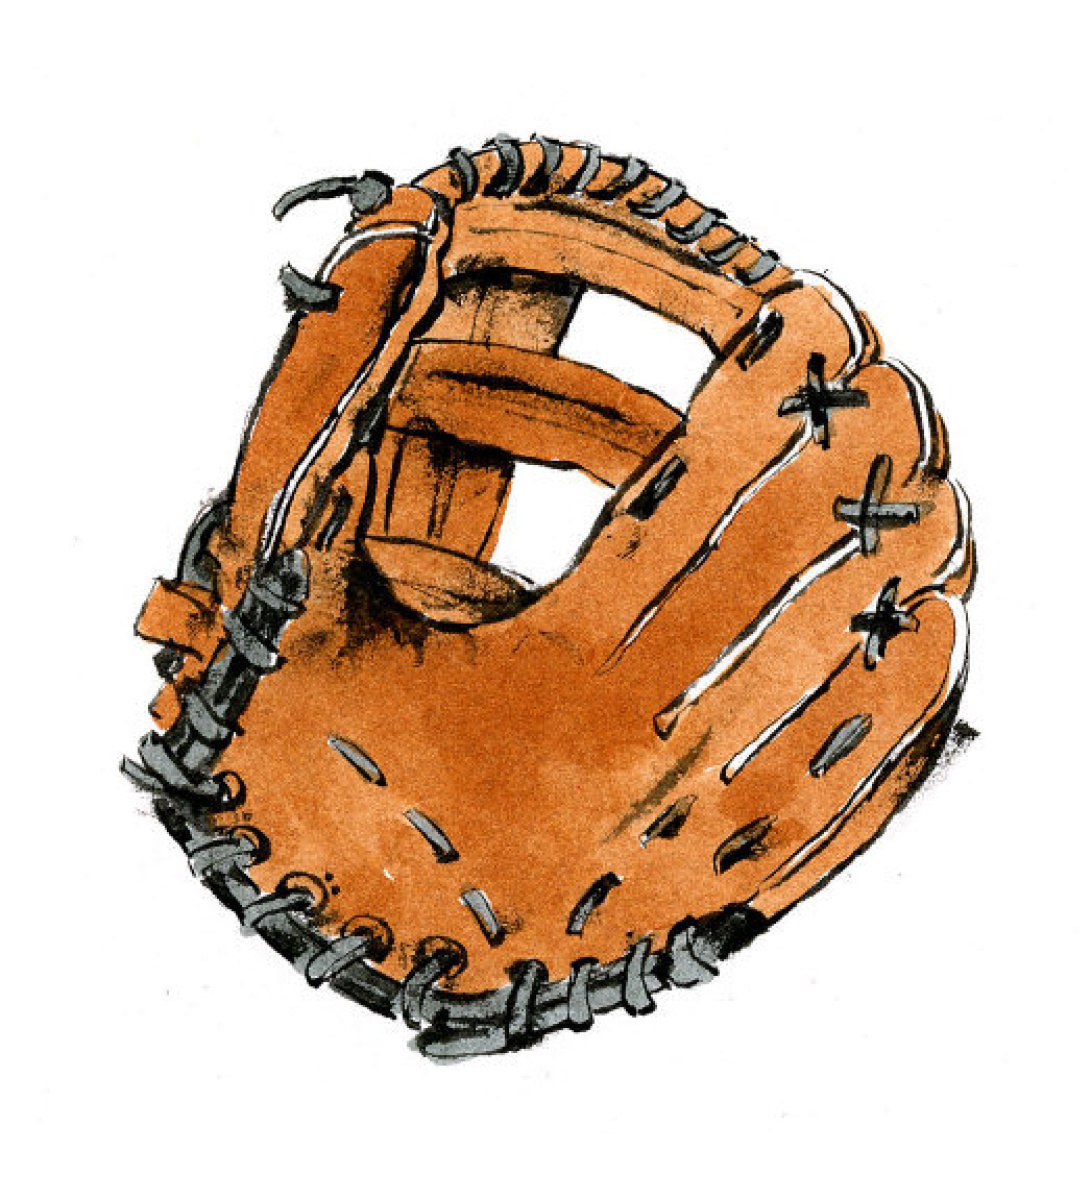 Free Cartoon Baseball Mitt, Download Free Clip Art, Free.